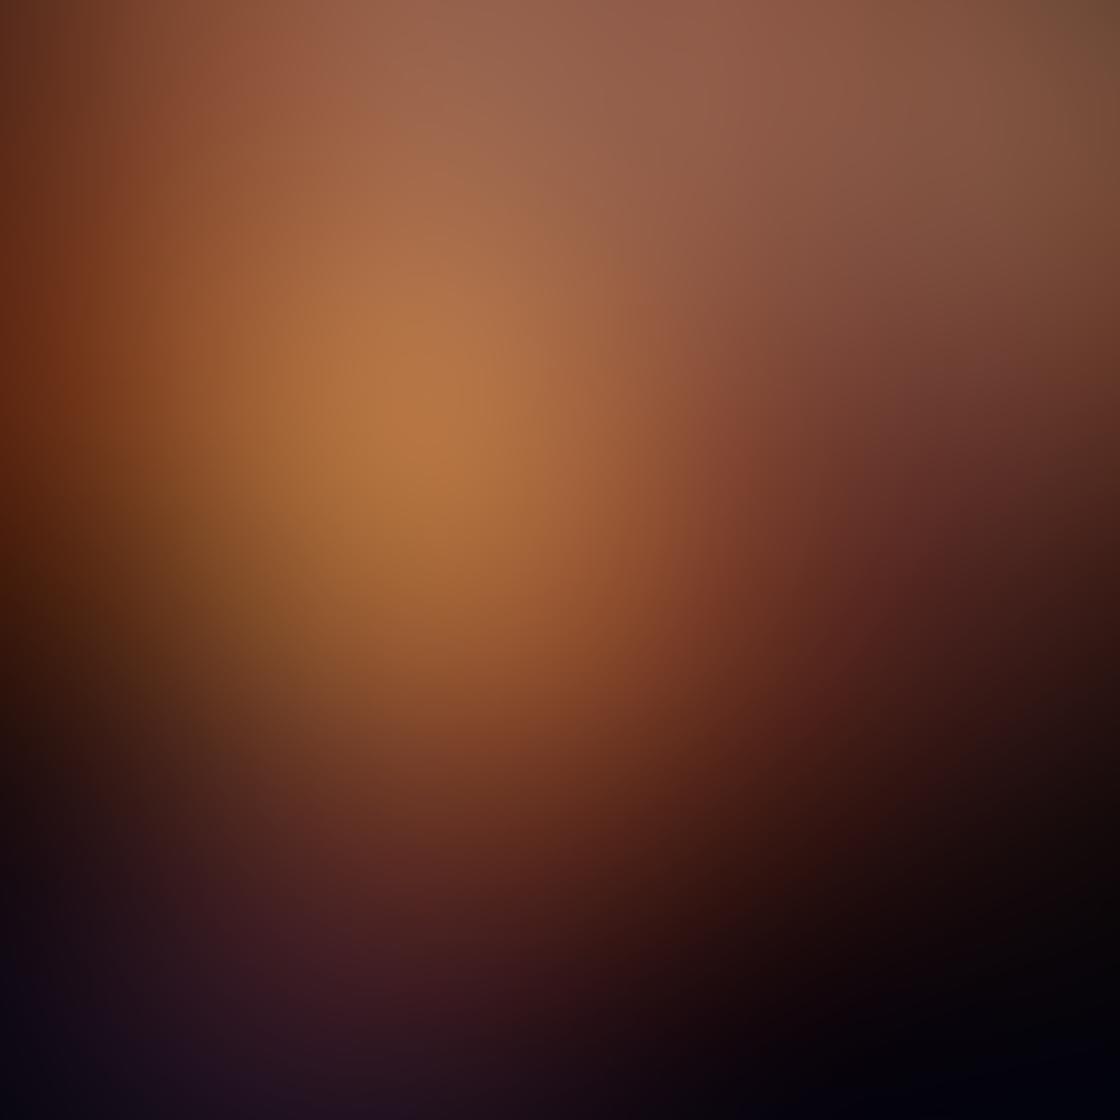 iPhone Sun Photo 21